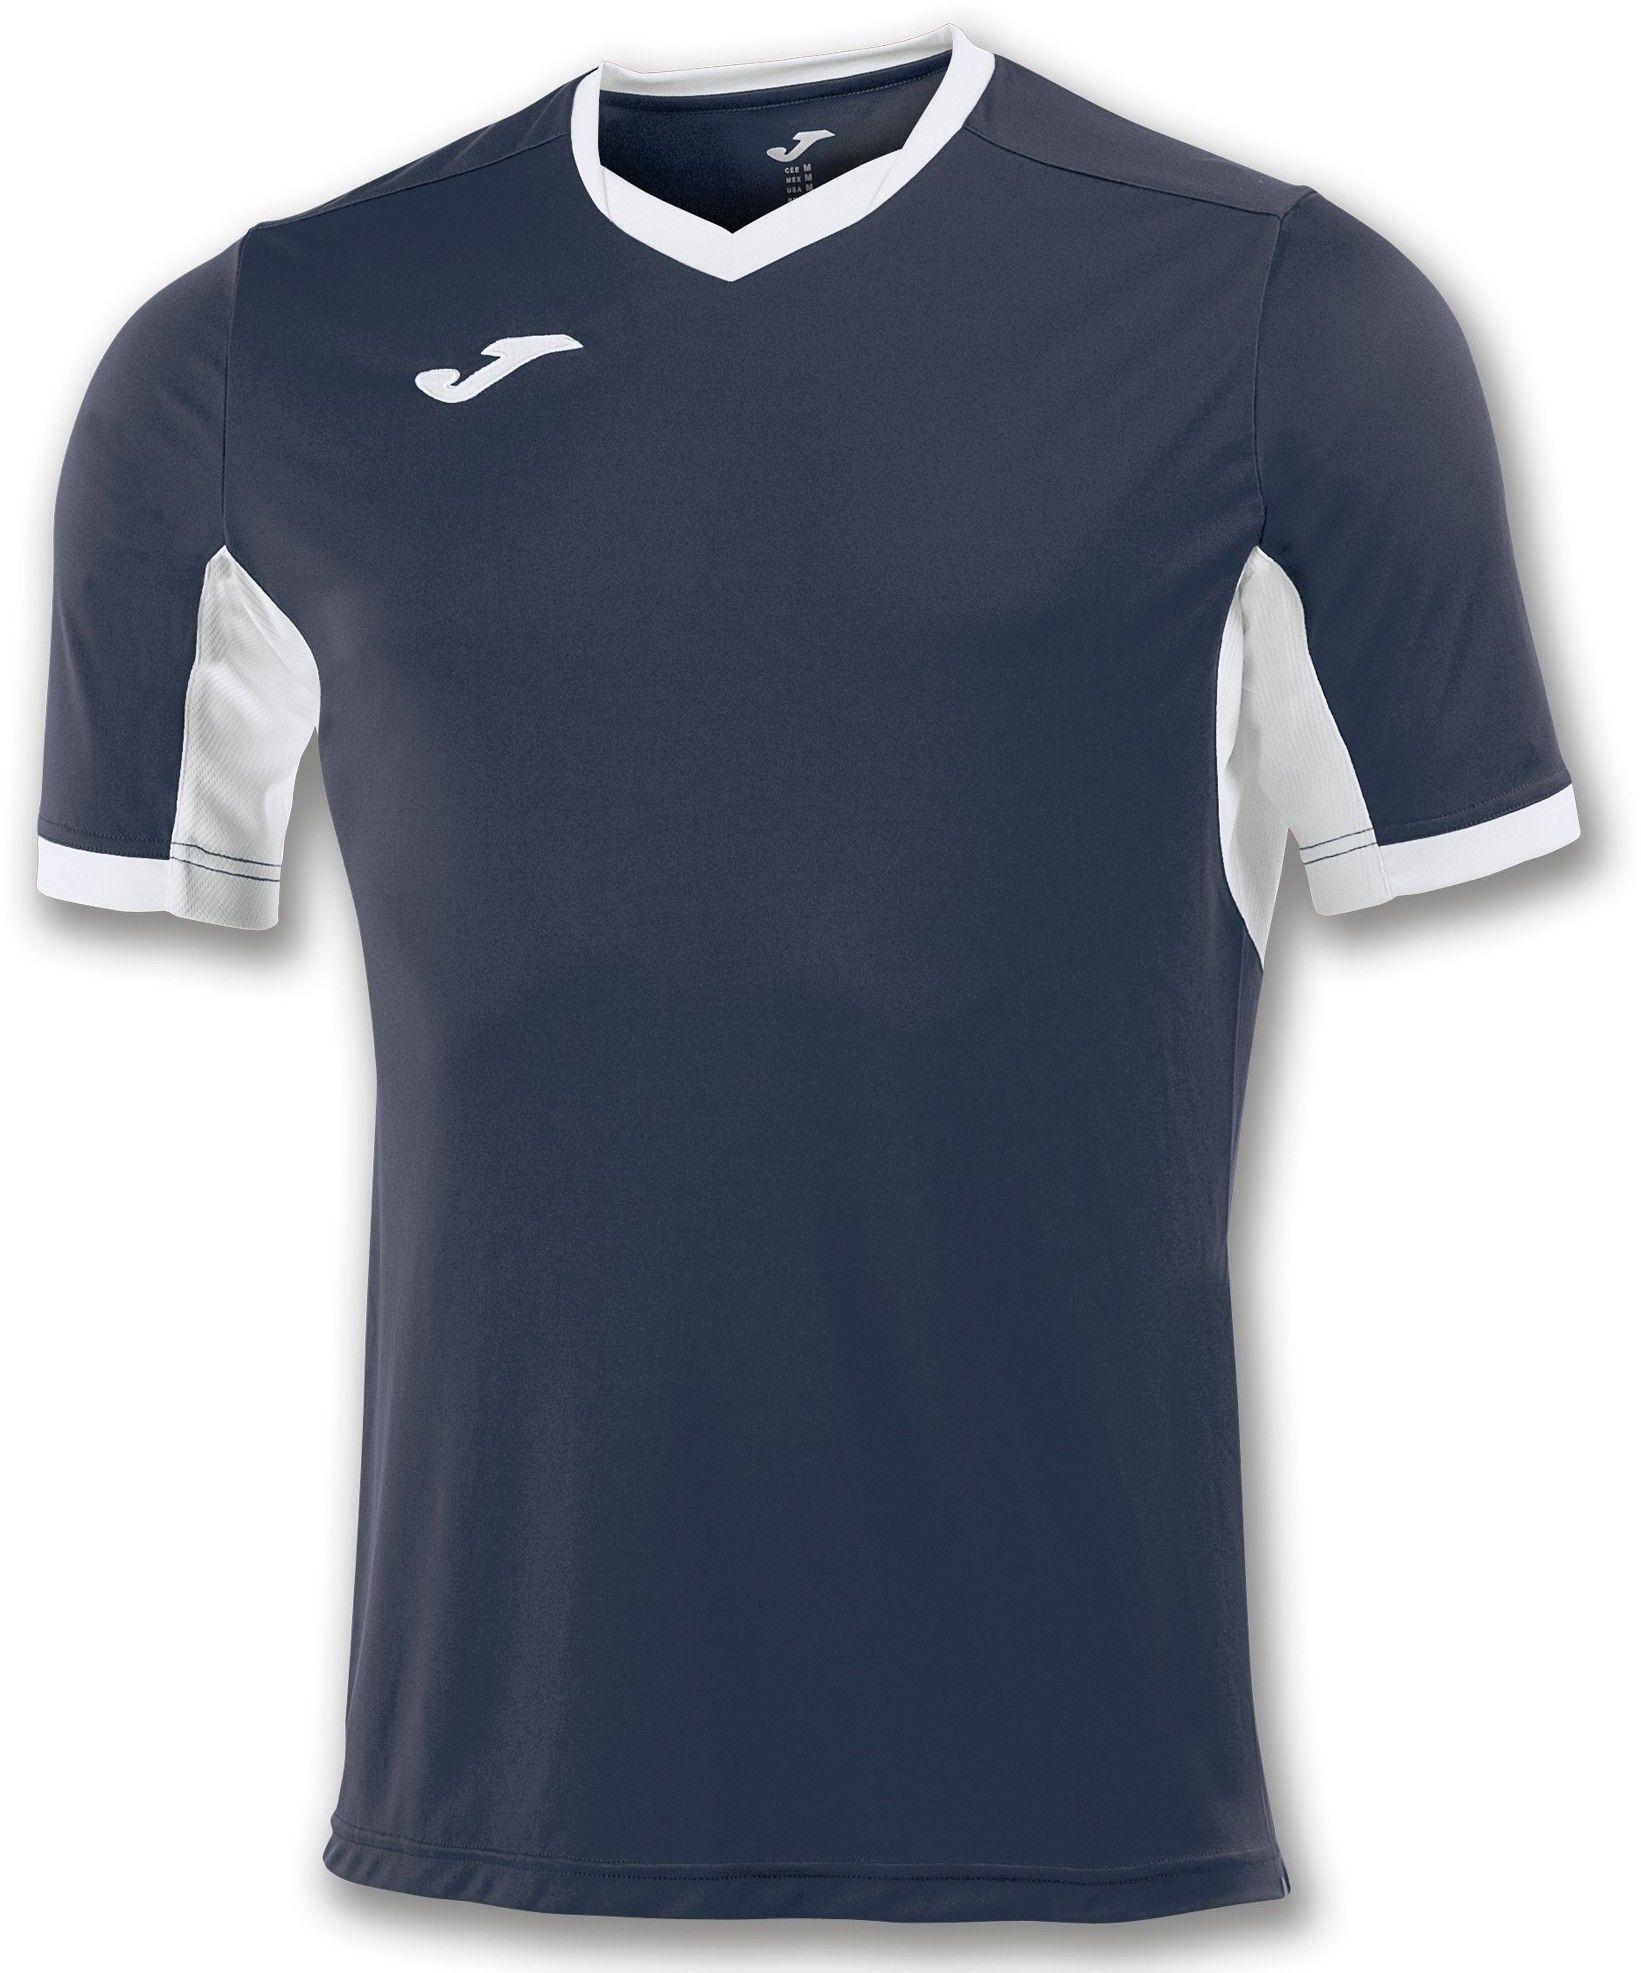 Koszulka Joma Champion IV dark navy/white (10 szt.)